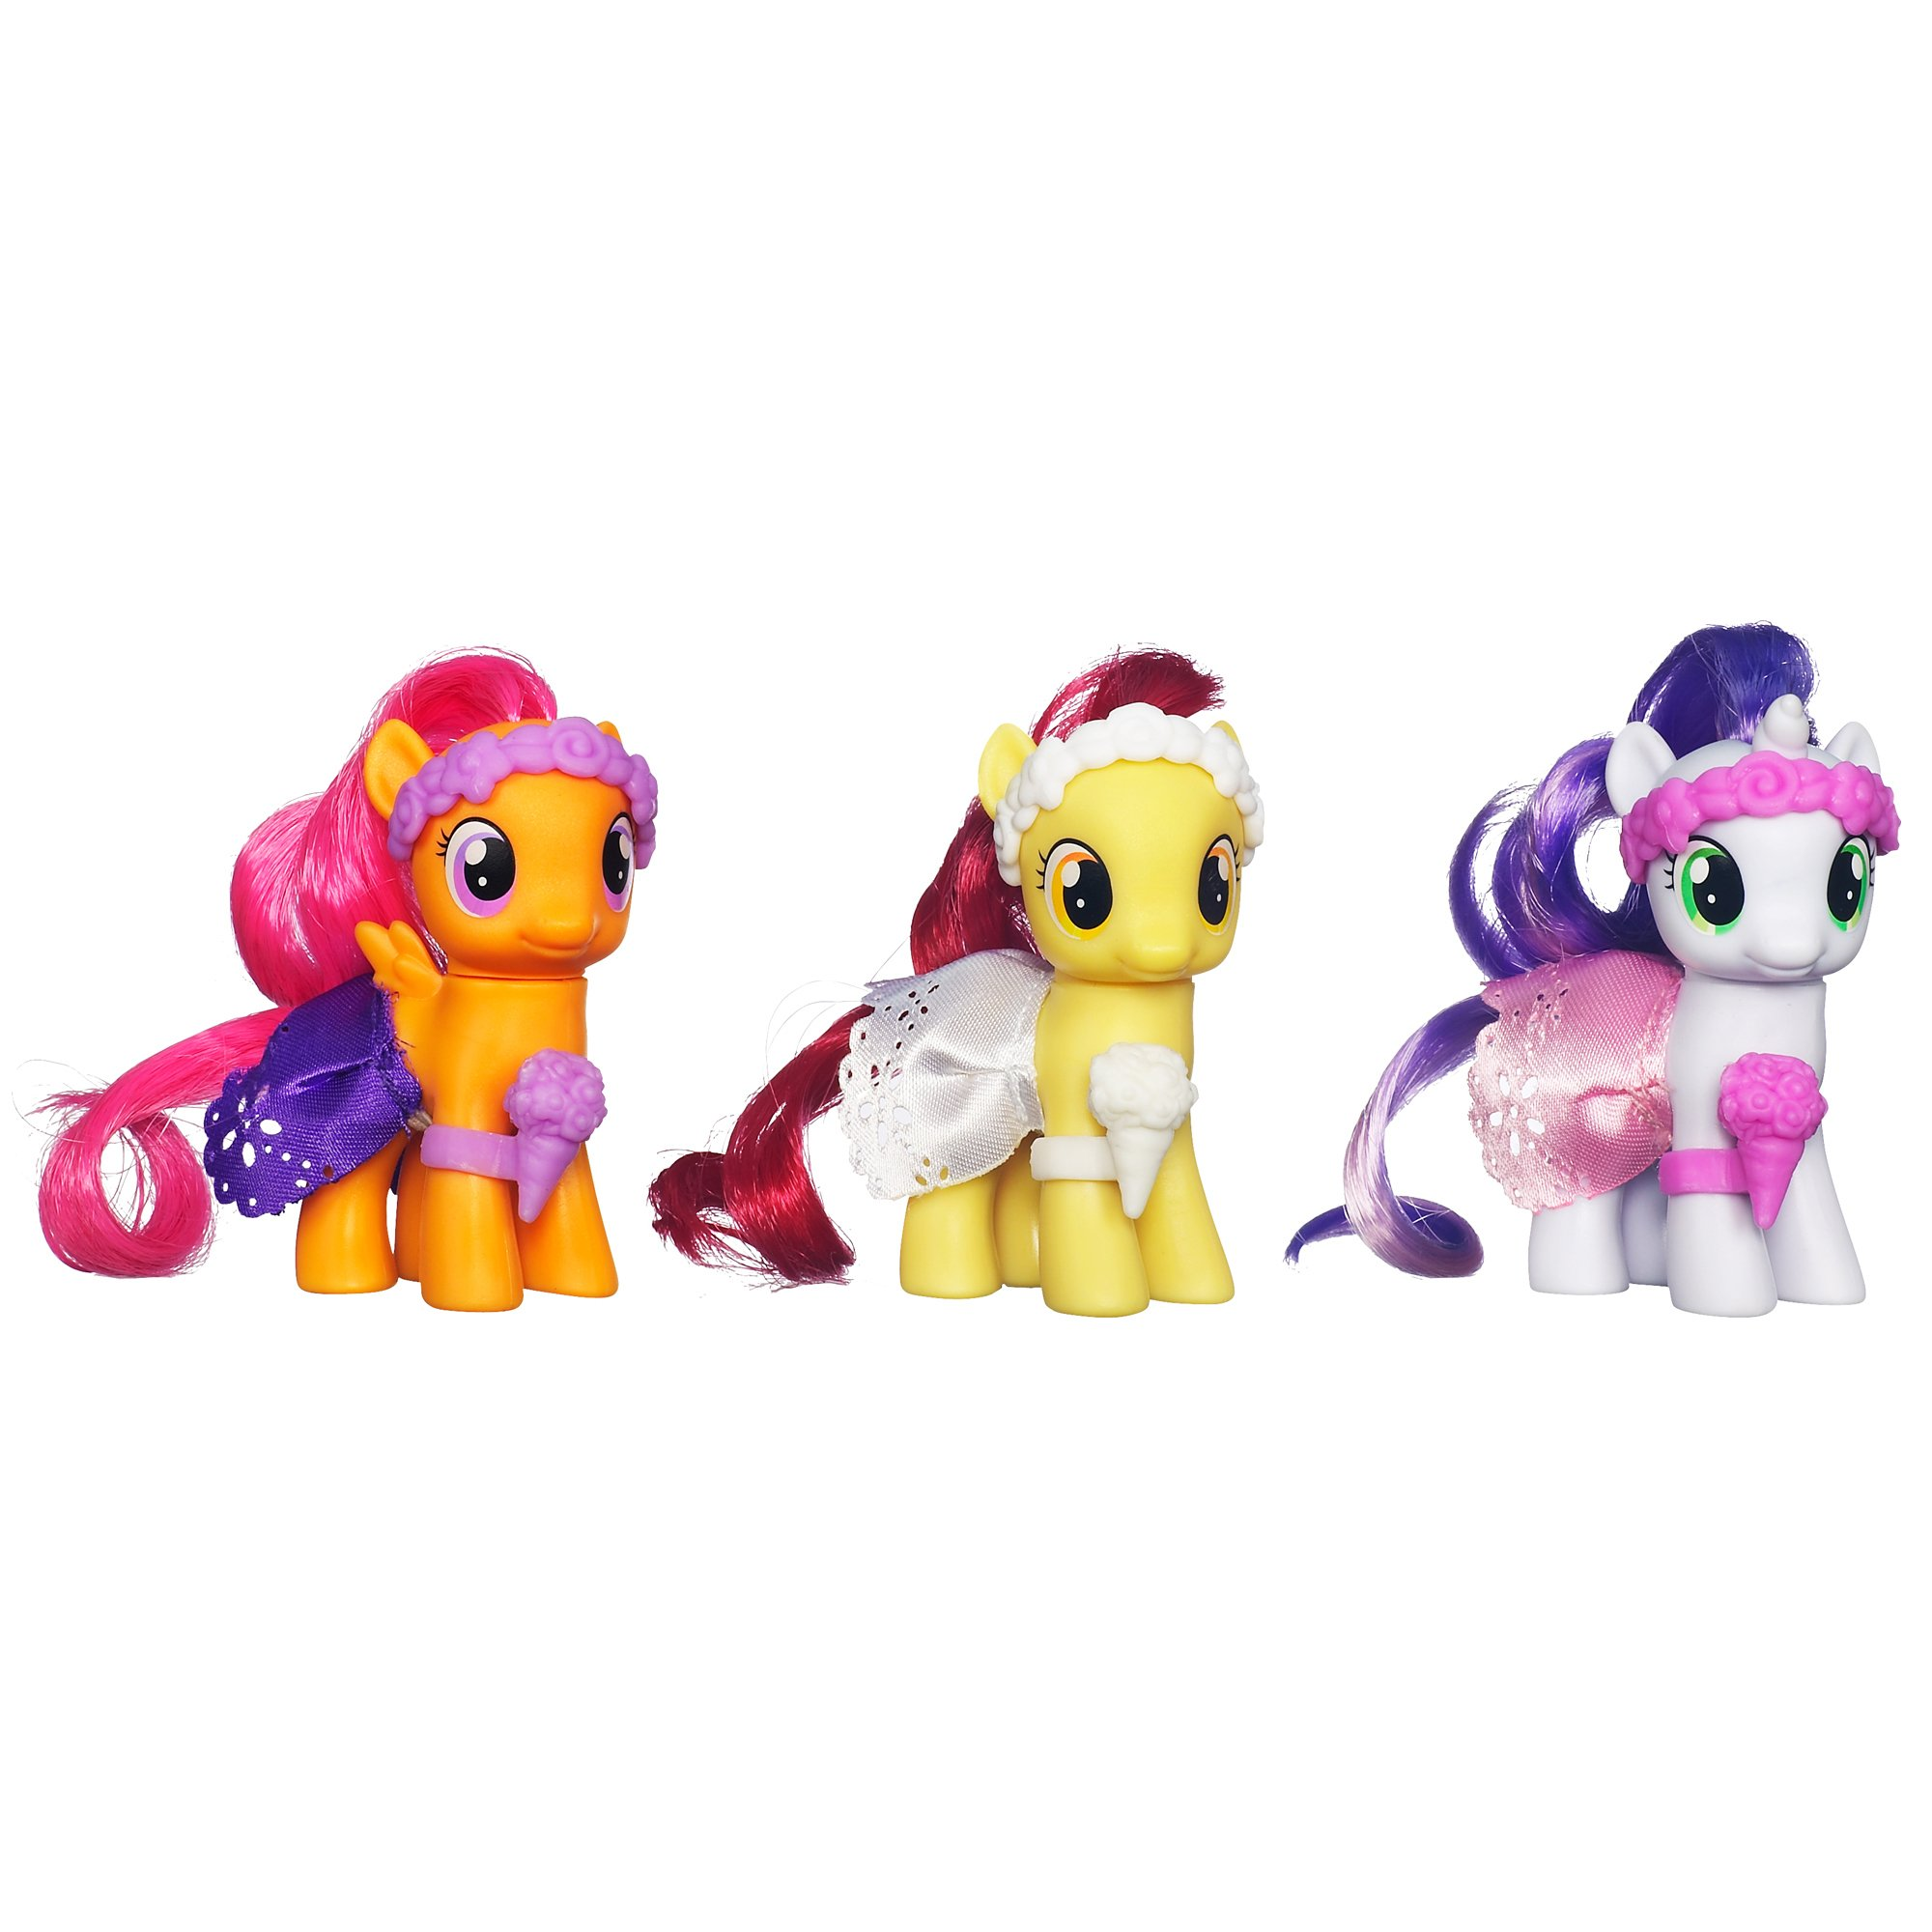 My Little Pony Wedding Flower Fillies Set Sweetie Belle Apple Bloom And Scoot 653569732242 Ebay